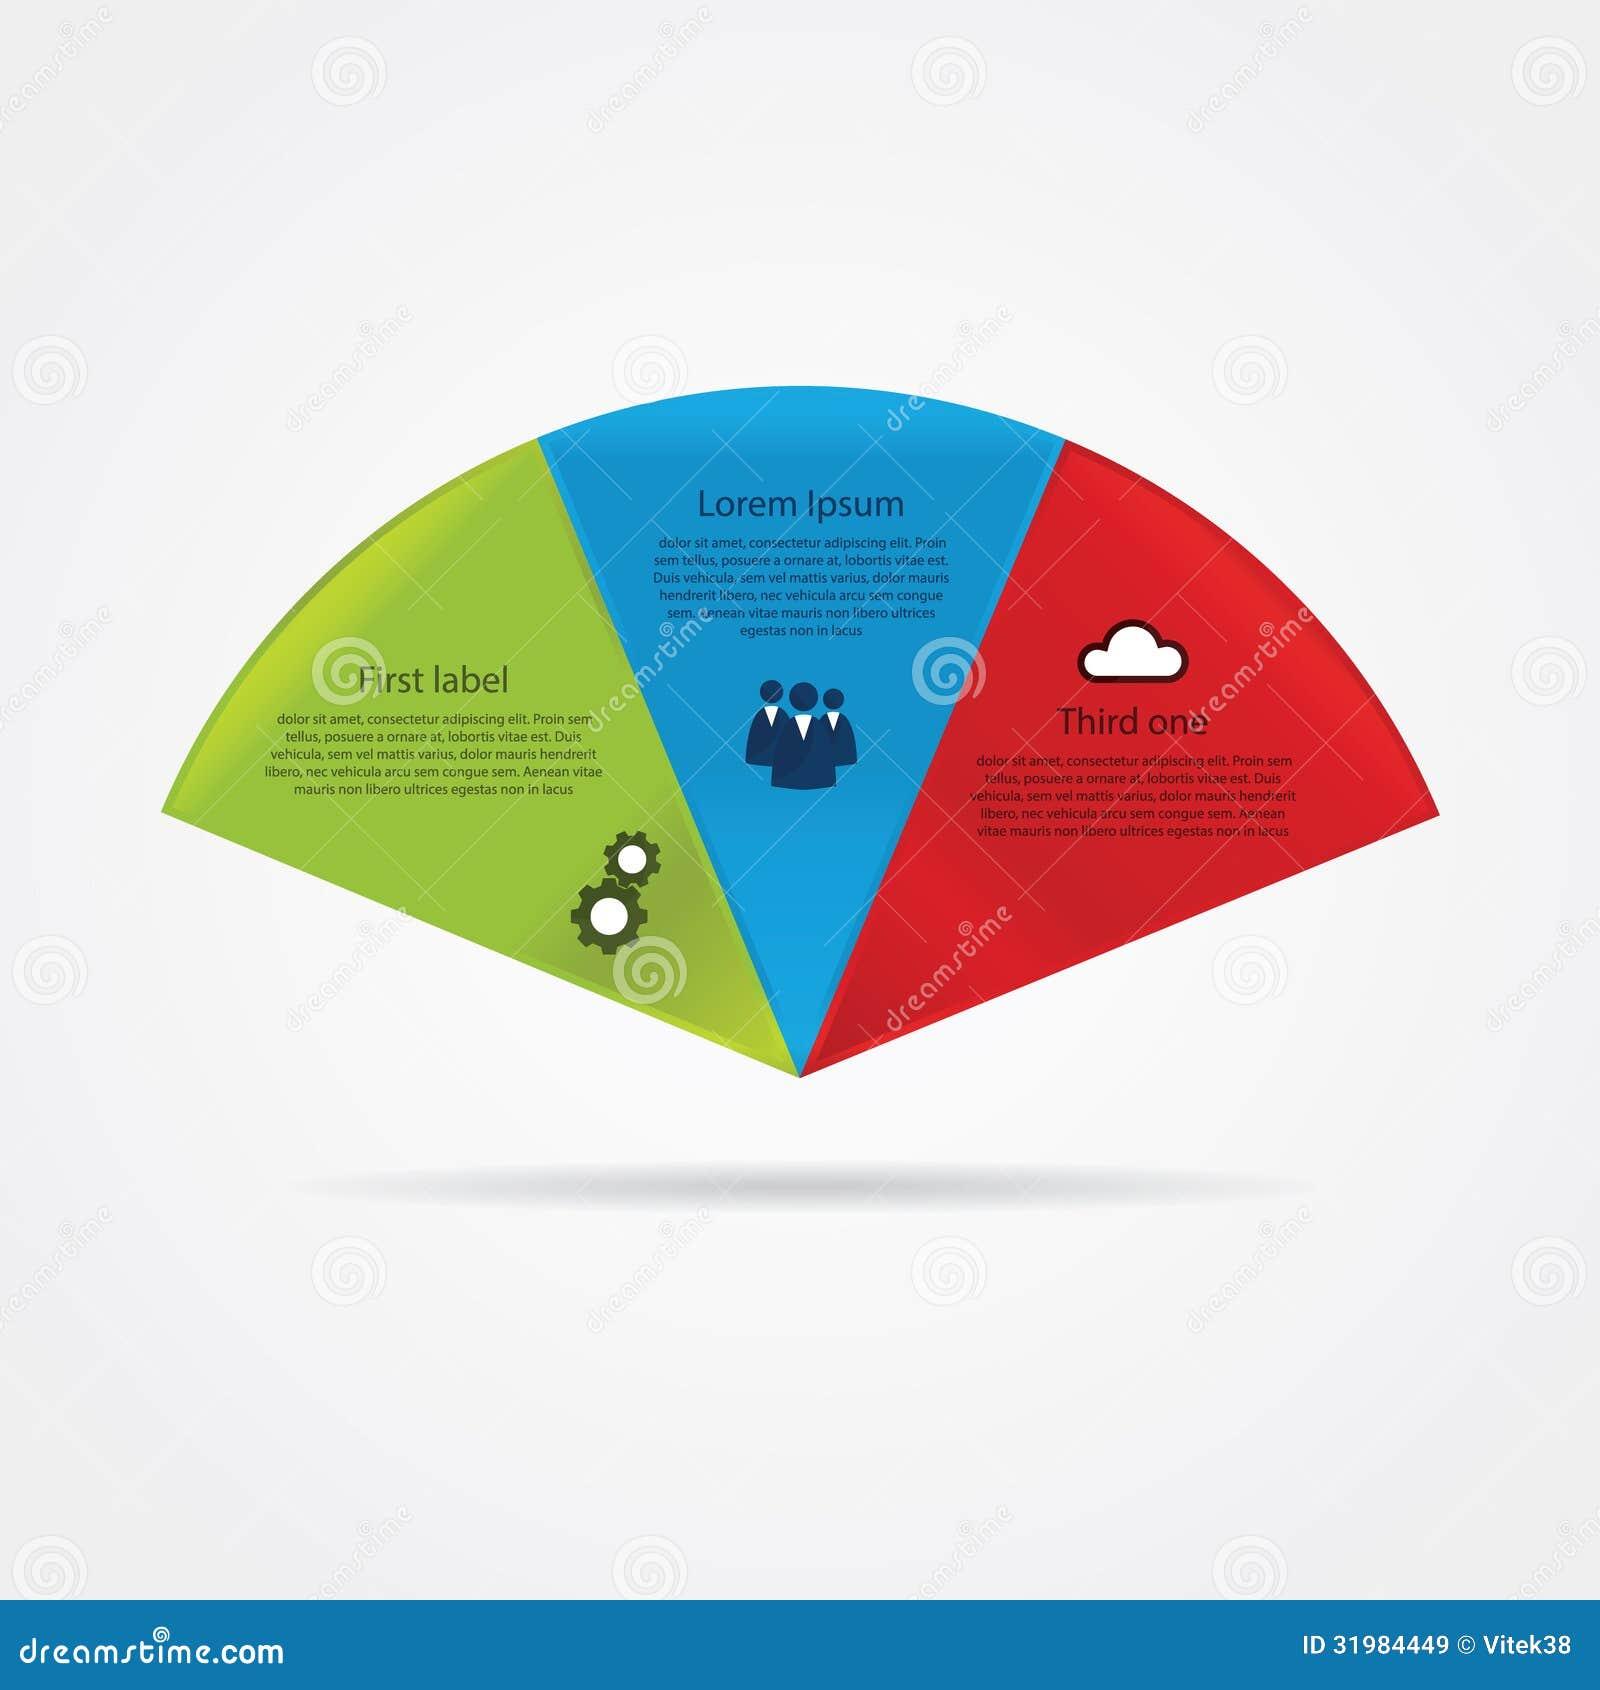 Digital & Content Marketing Summit